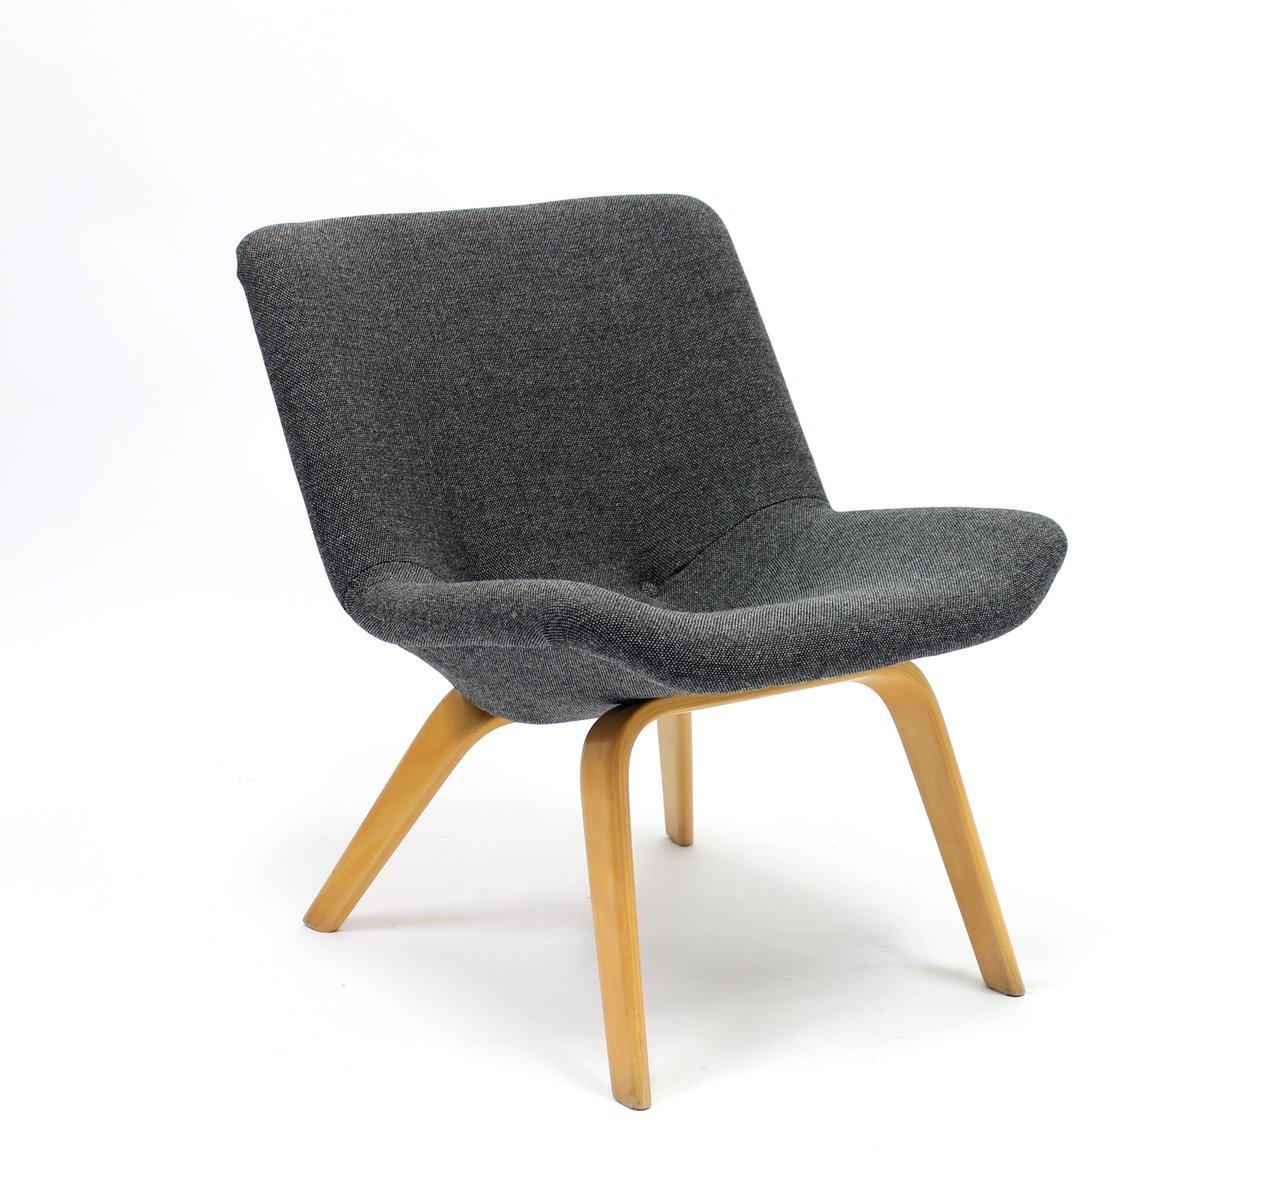 Stuhl von Carl Gustaf Hiort af Ornäs für Gösta Westerberg, 1950er